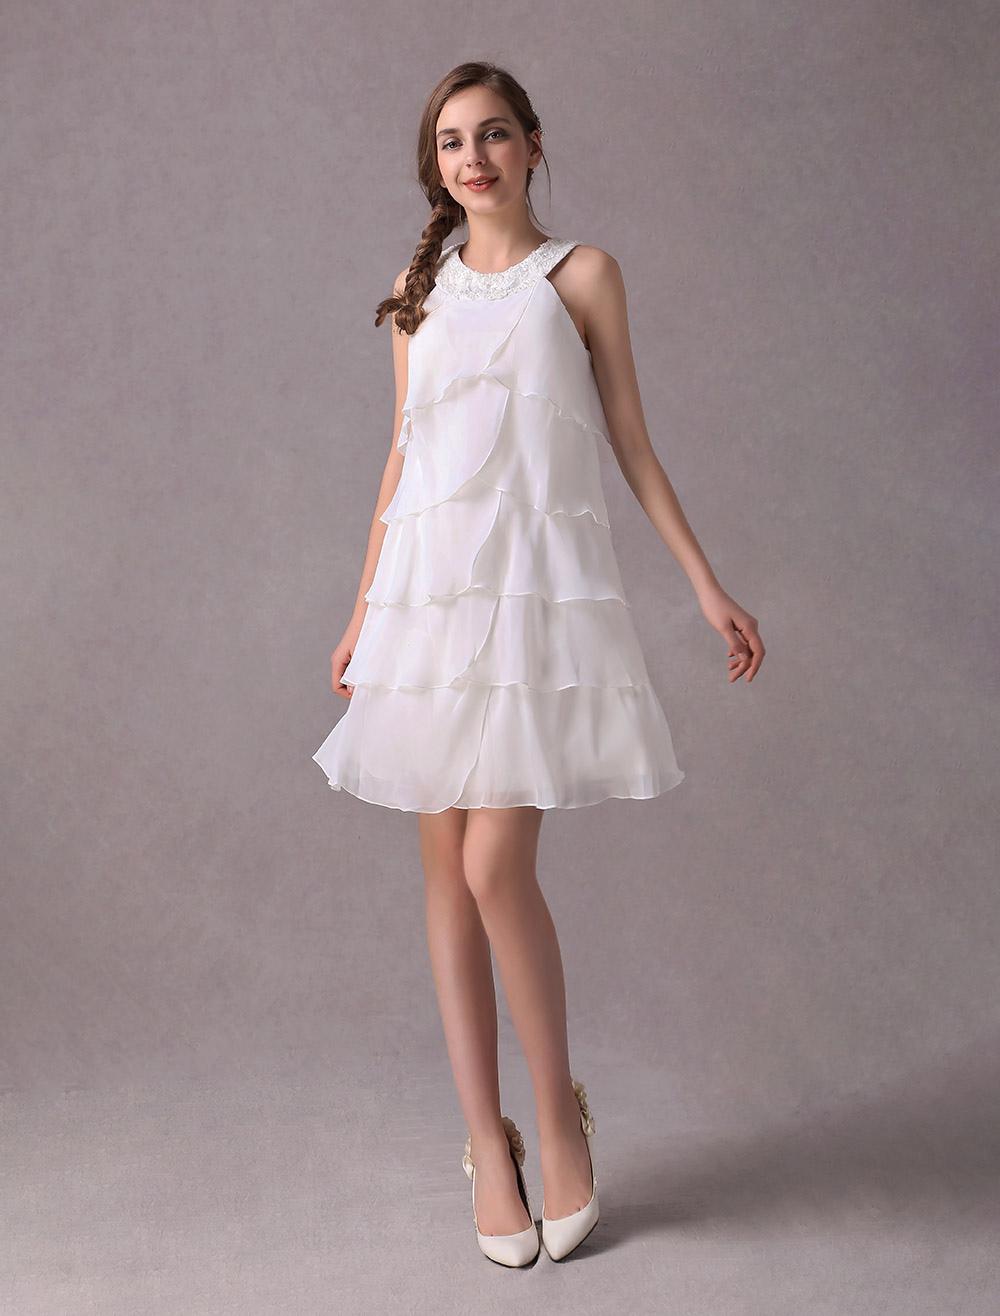 e73e327949f Short Wedding Dresses Ivory Chiffon Cocktail Party Dress Beaded ...